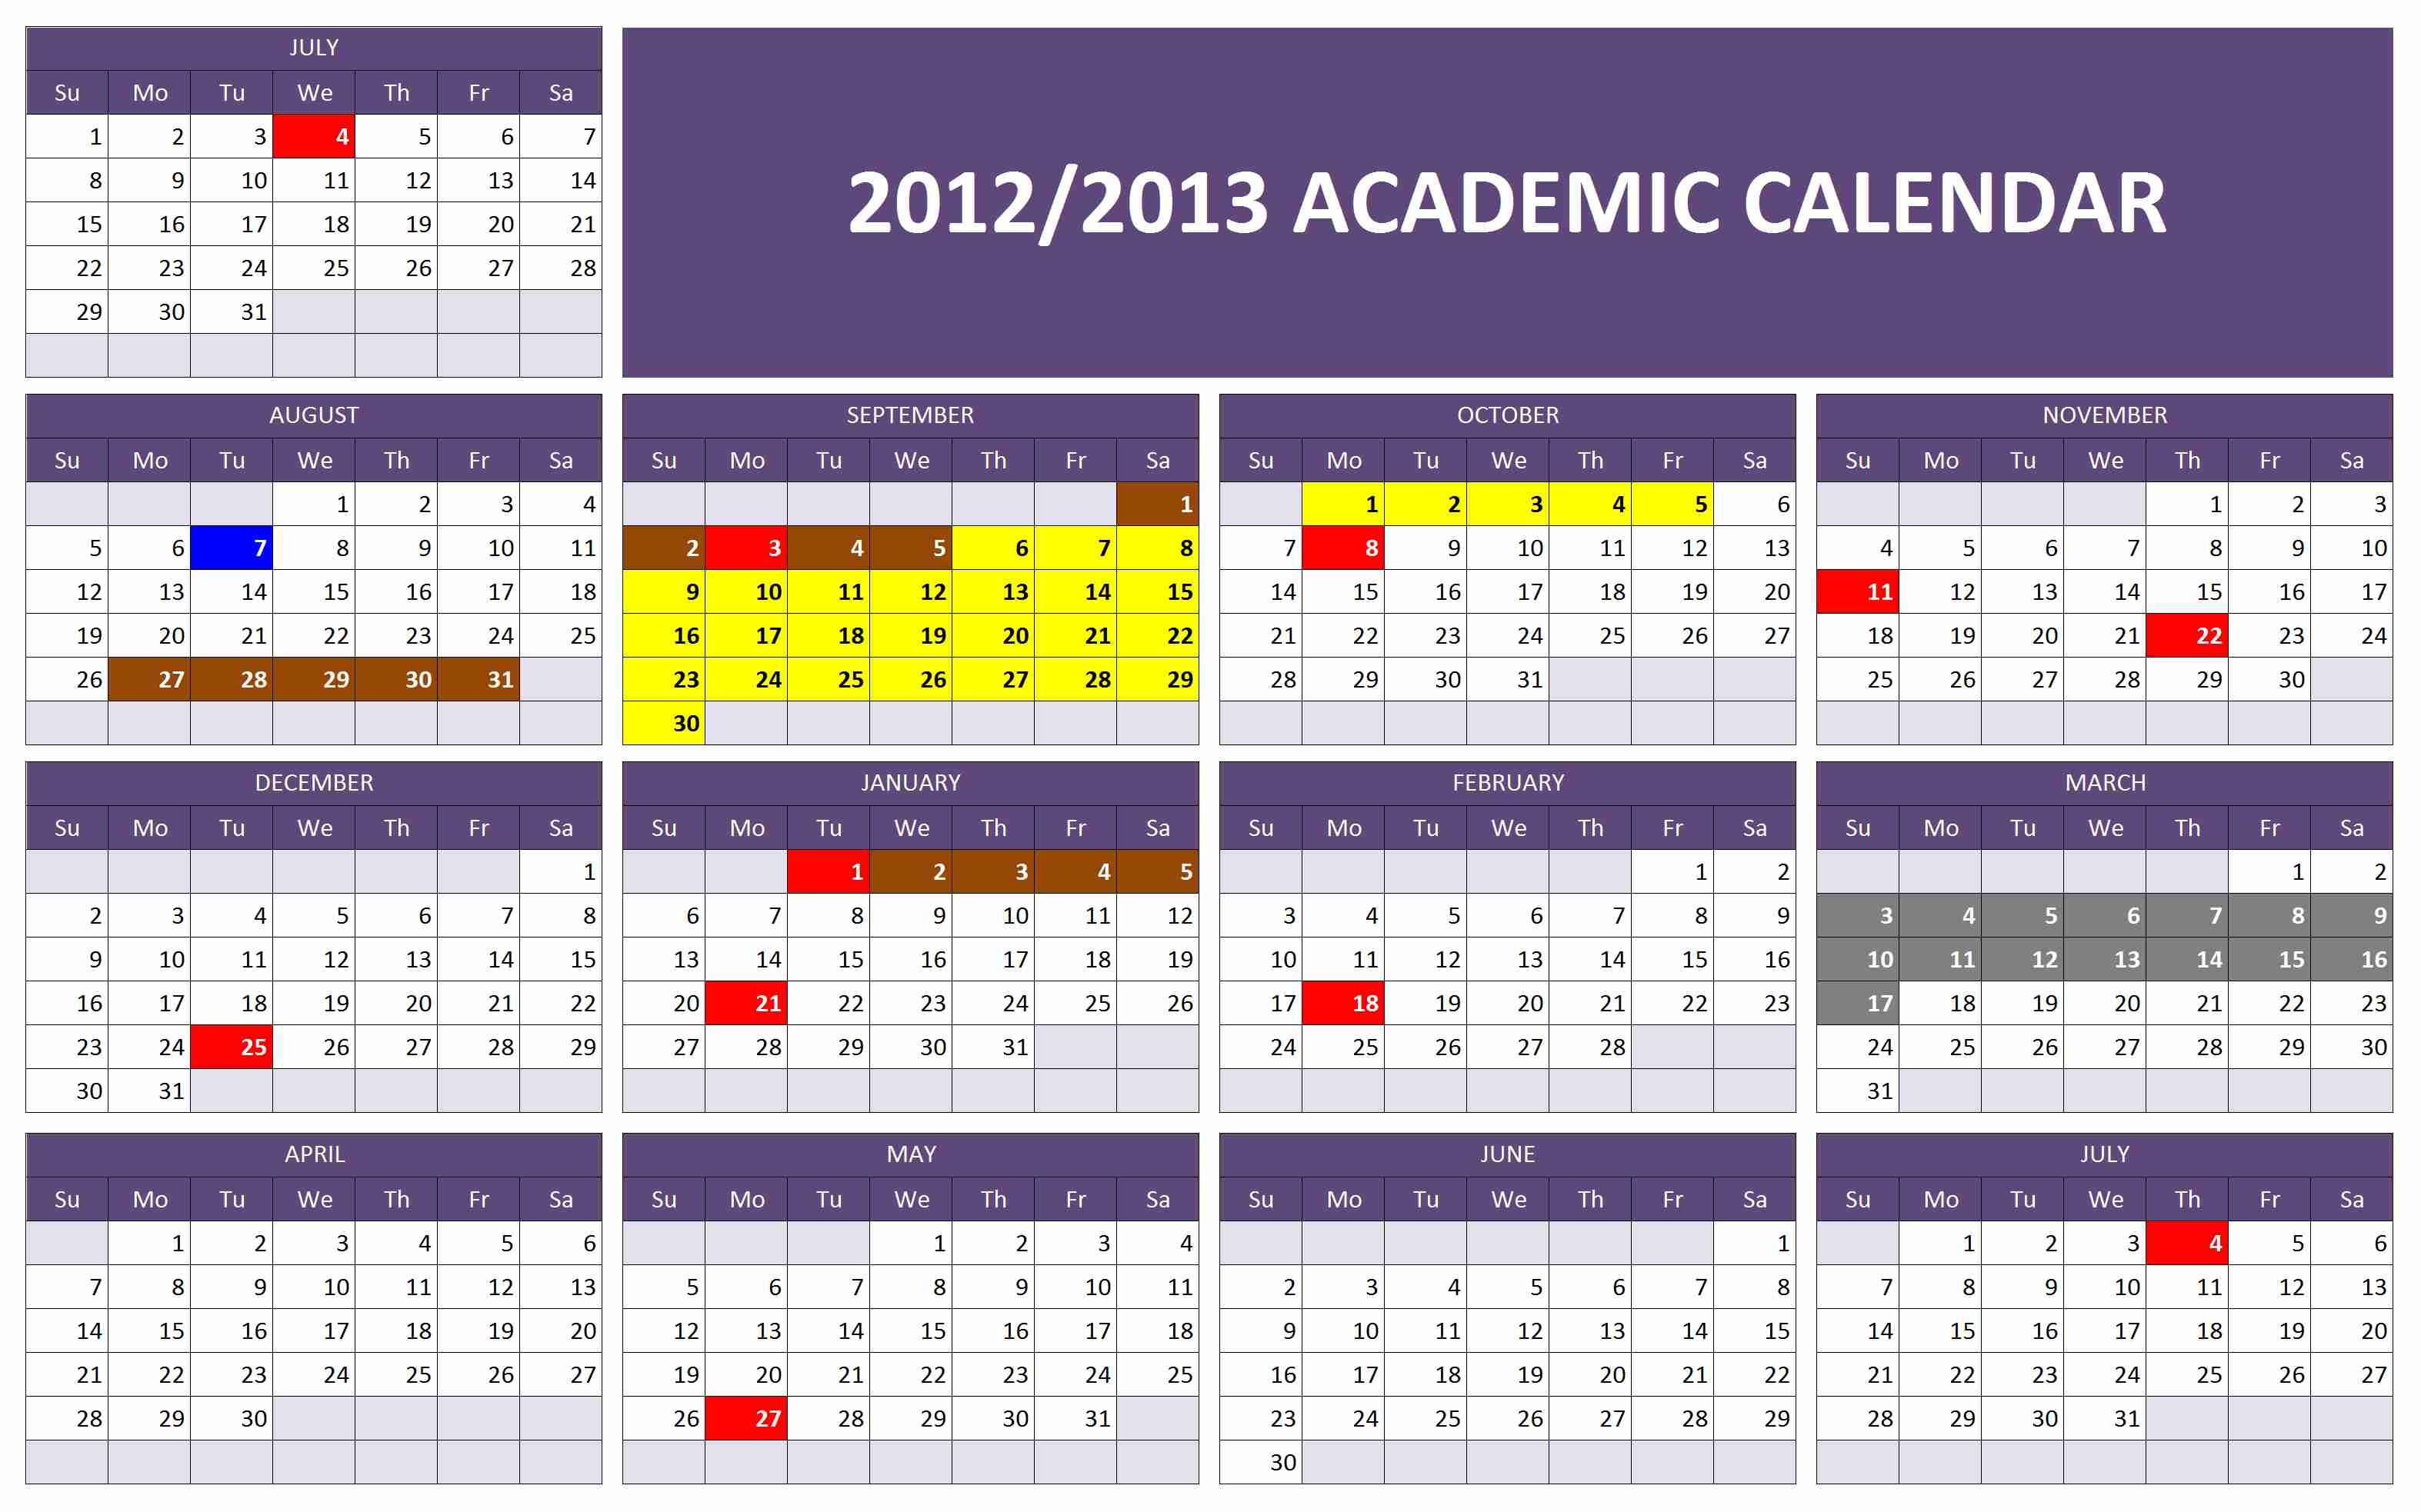 School Calendar 2012 2013